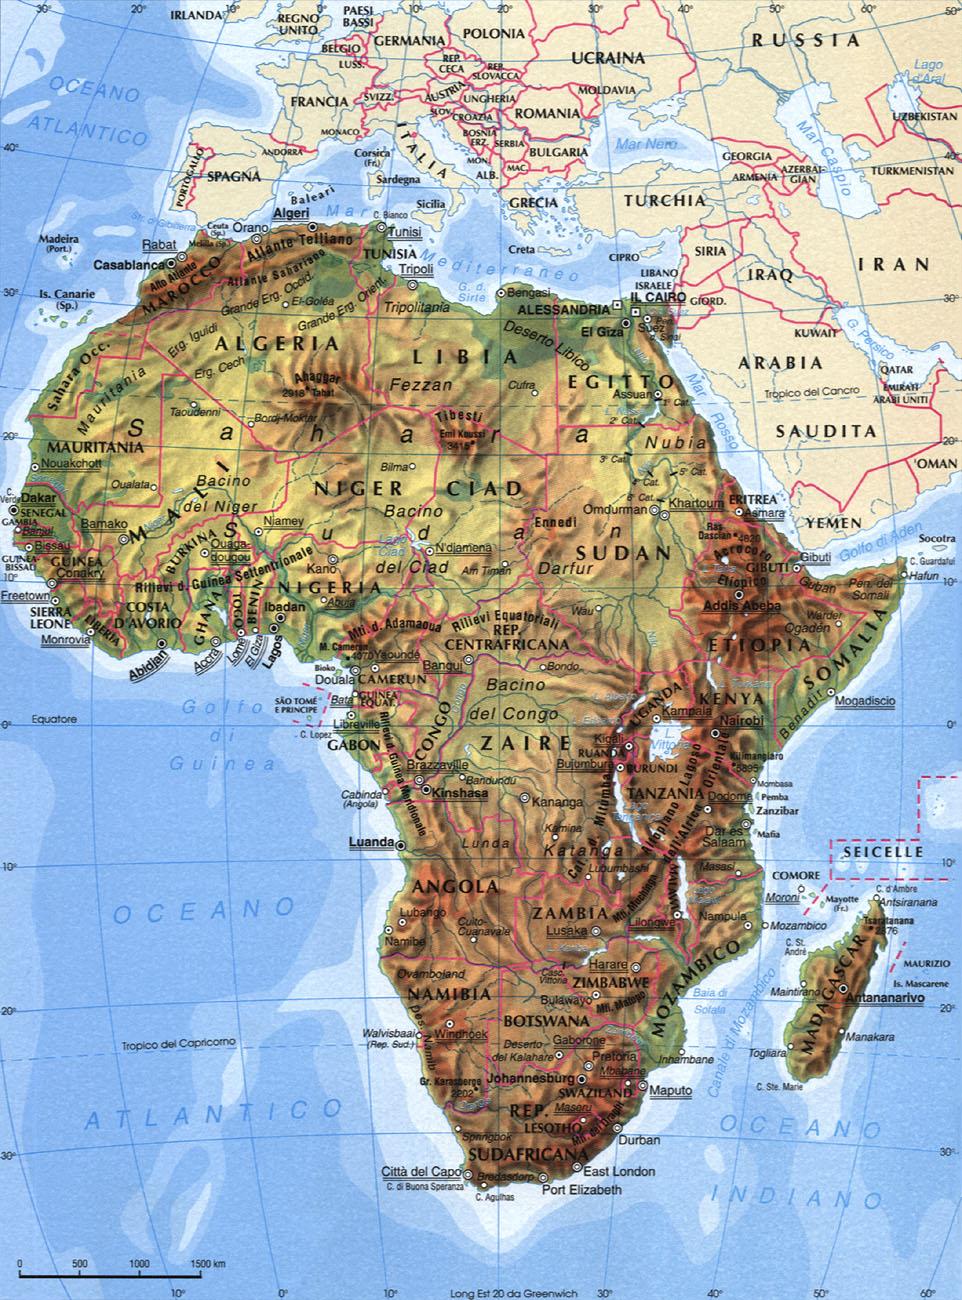 Cartina dell'Africa